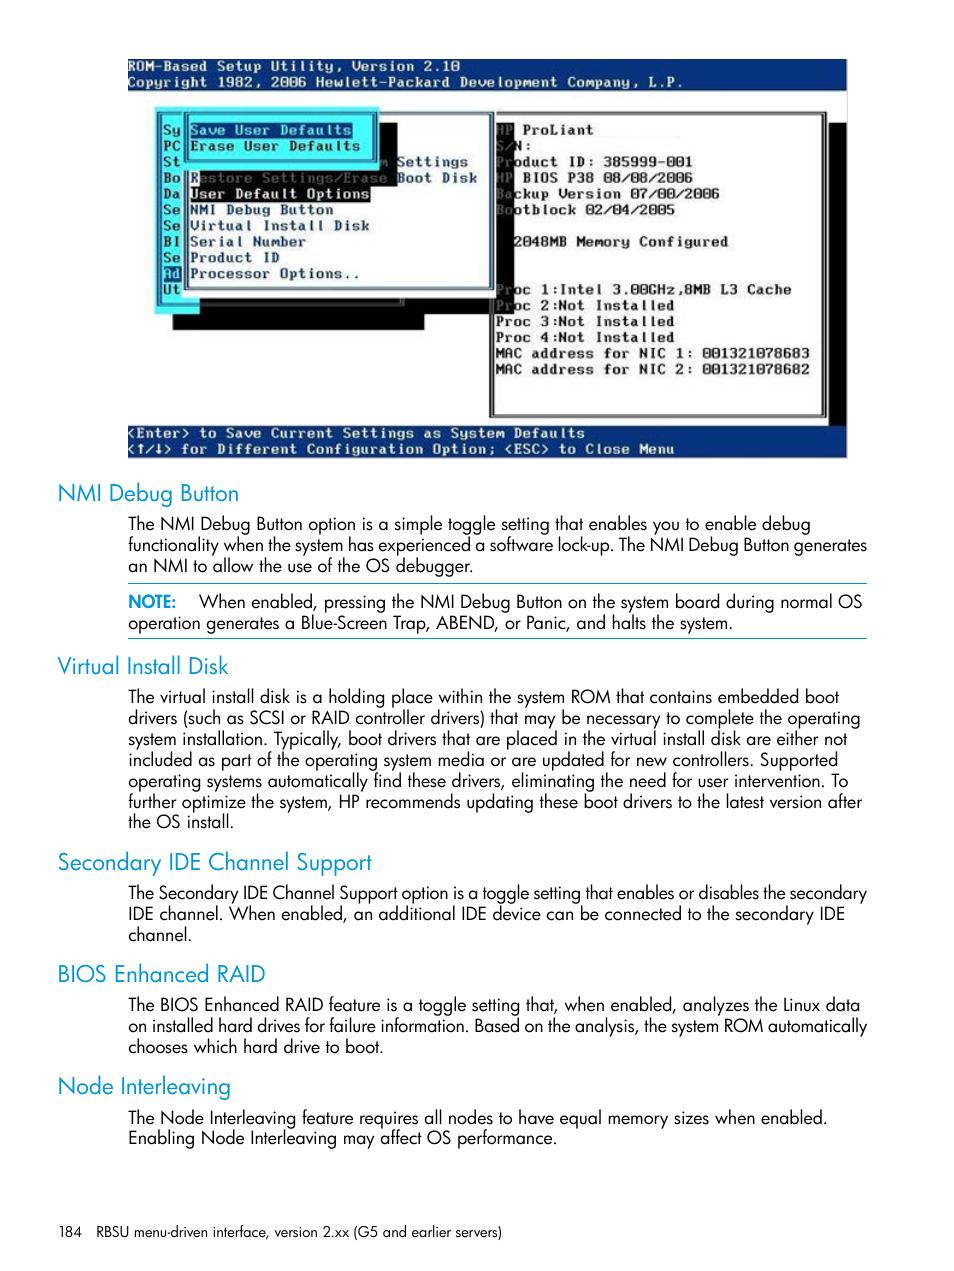 Nmi debug button, Virtual install disk, Secondary ide